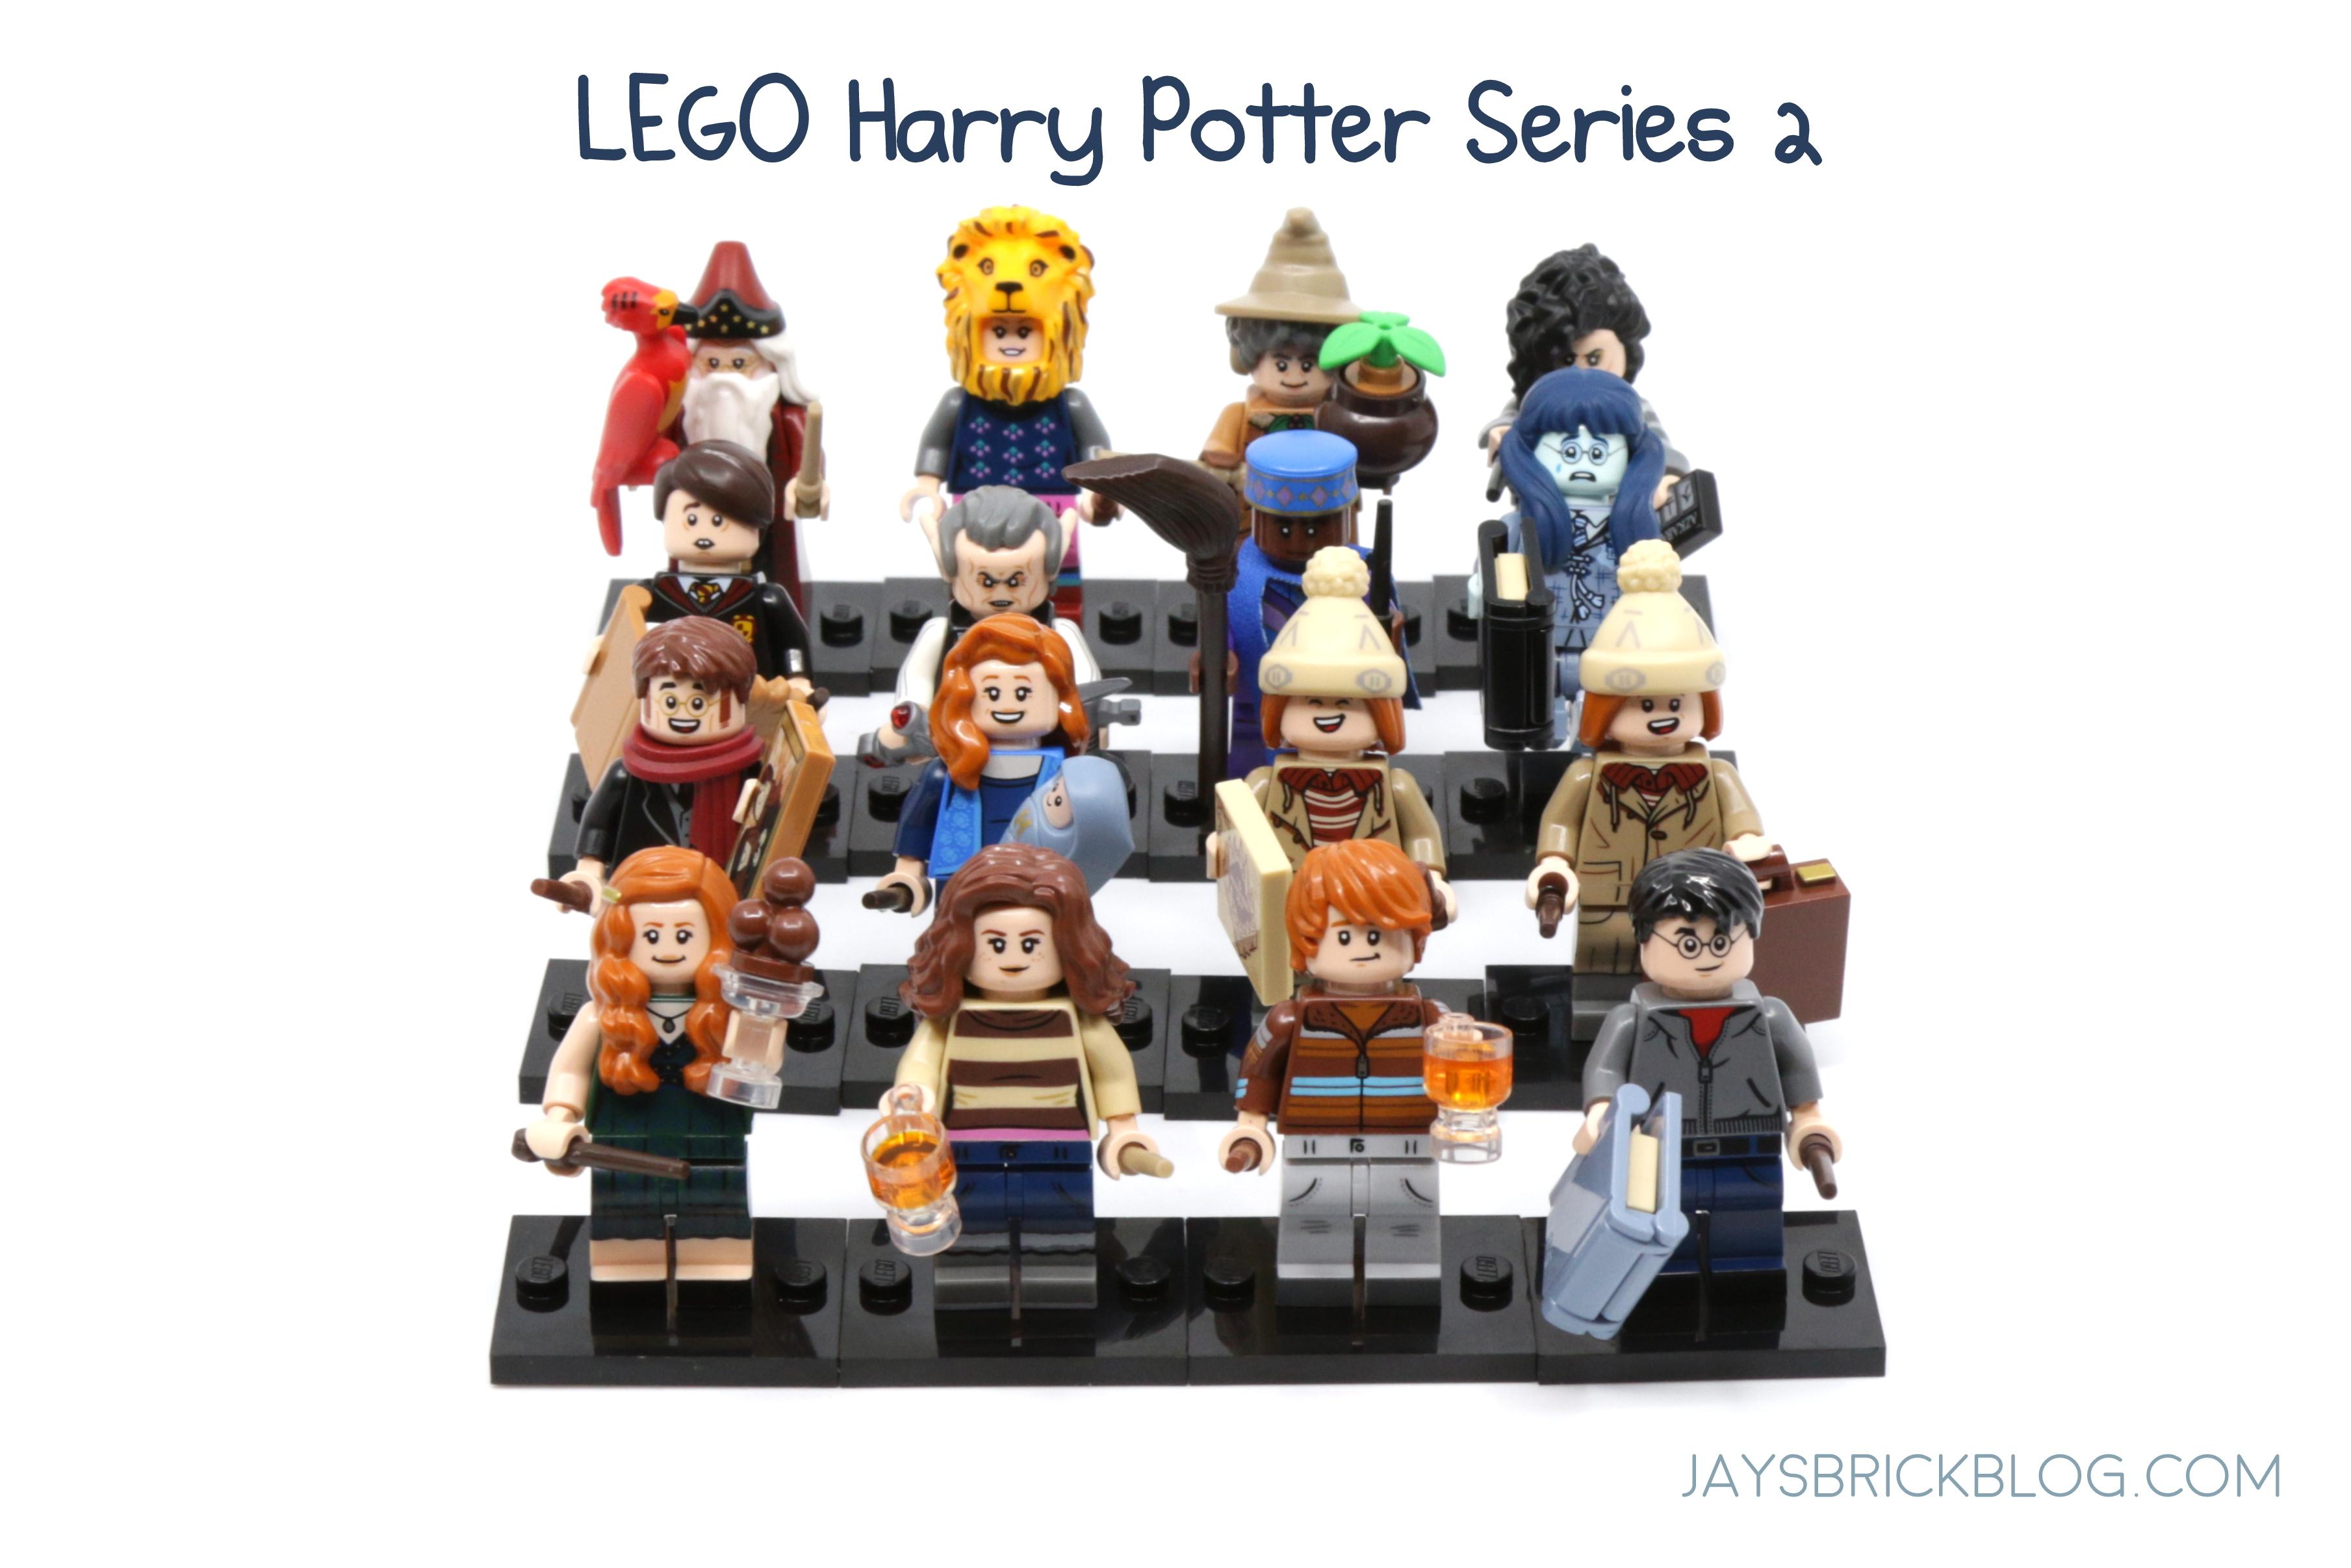 NEW LEGO WIZARD SANTA CLAUS minifigure figure minifig christmas harry potter hp